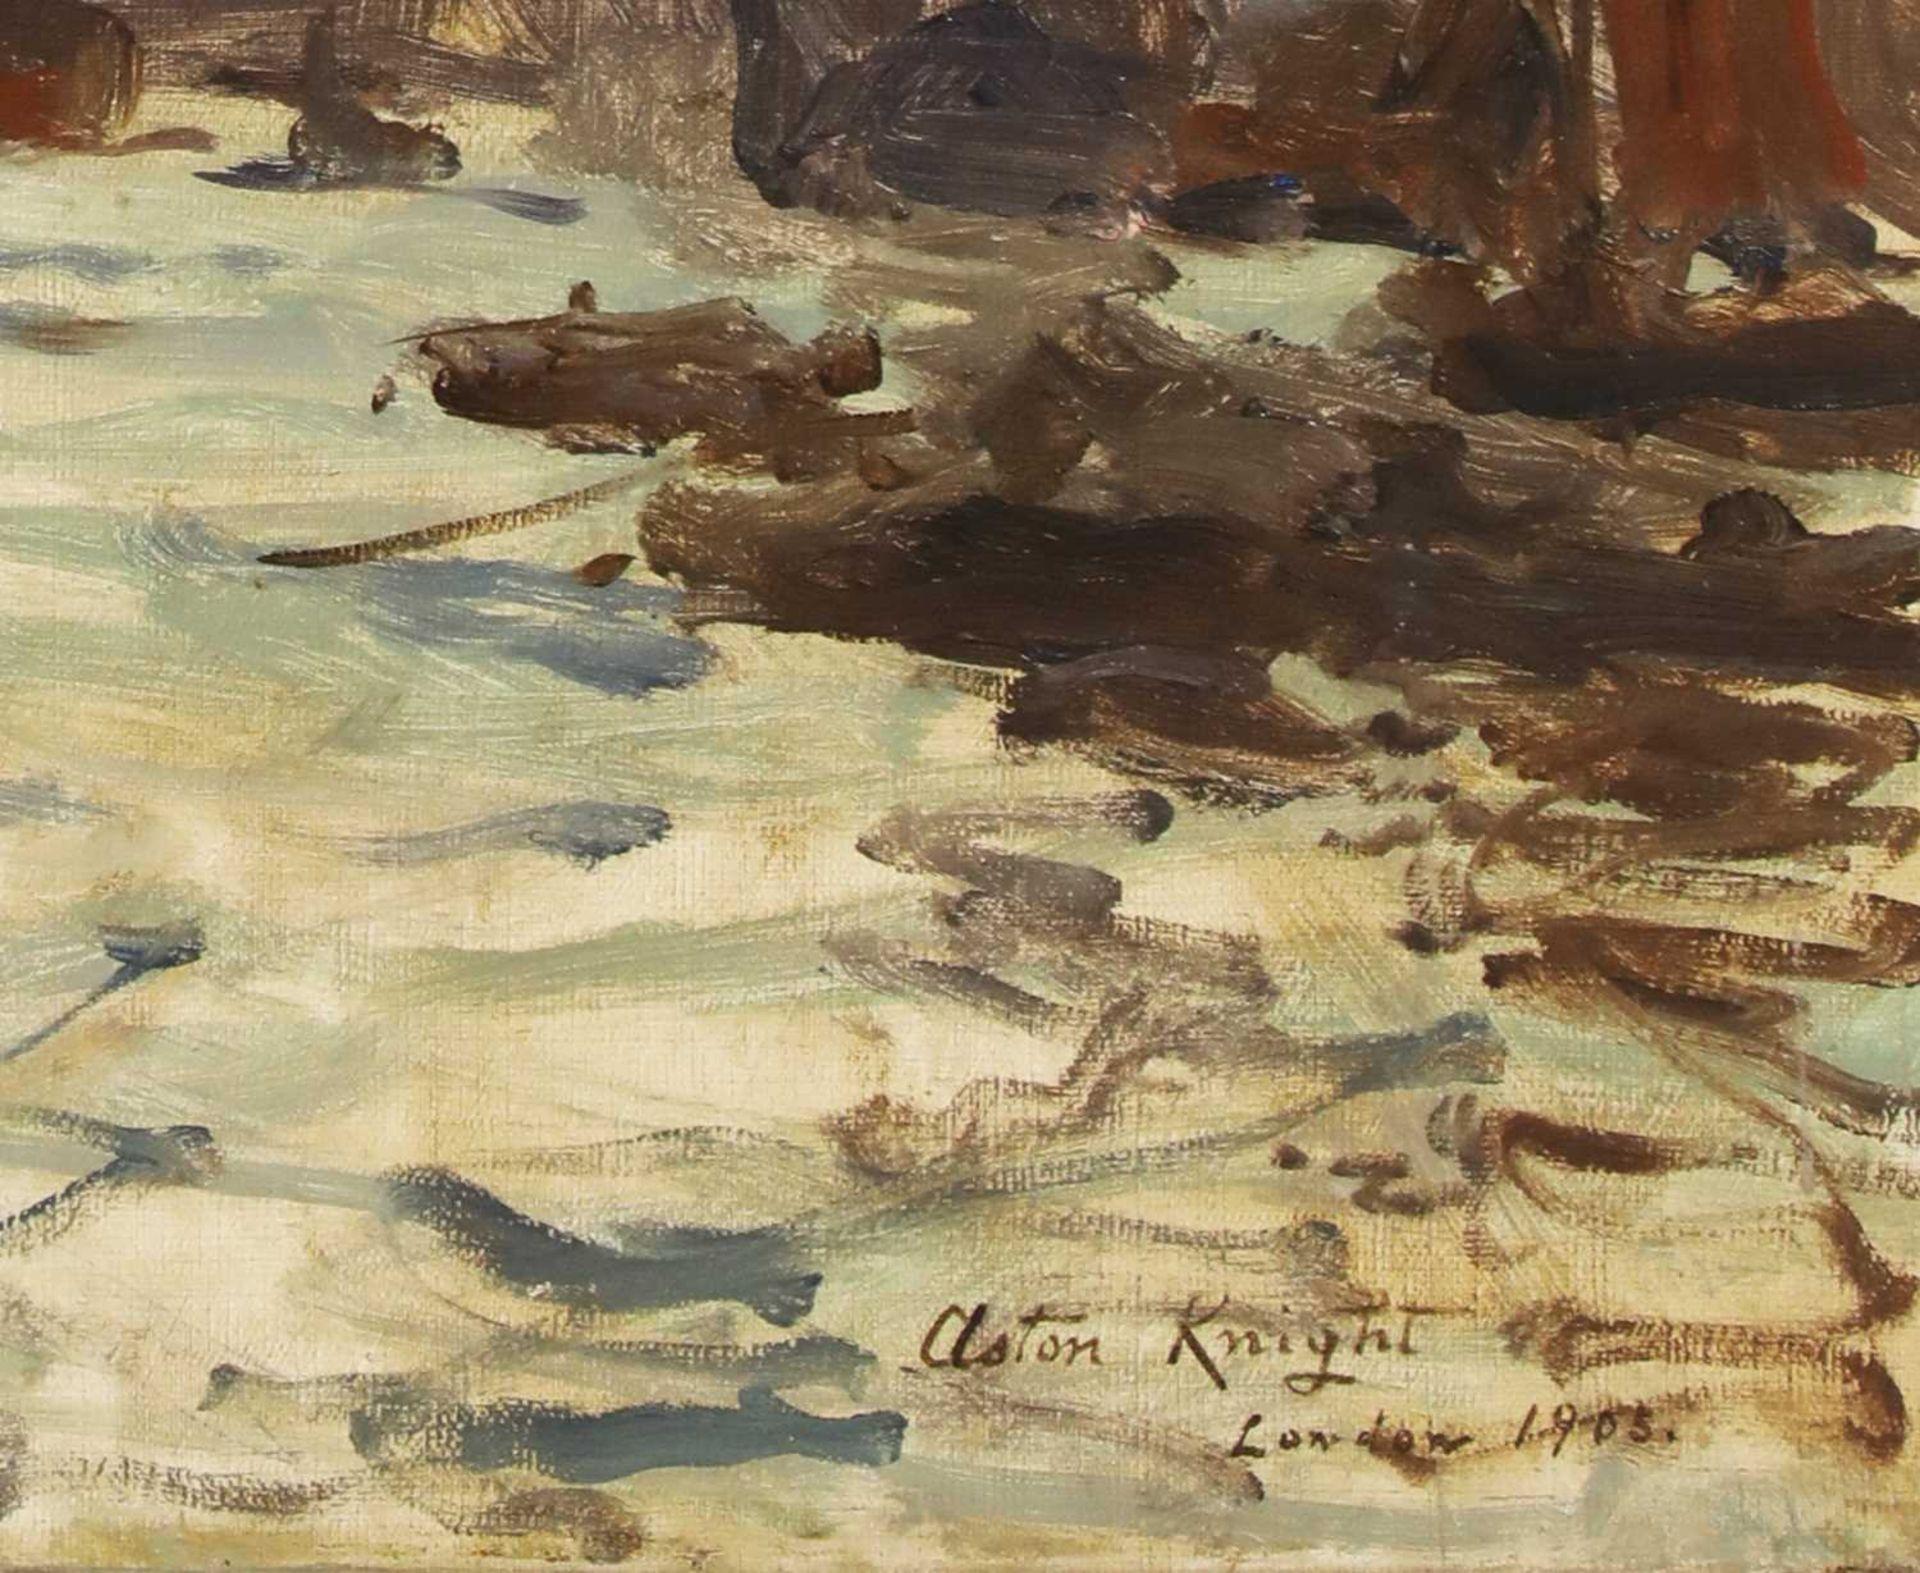 LOUIS ASTON KNIGHT (1873-1948) - Image 3 of 4